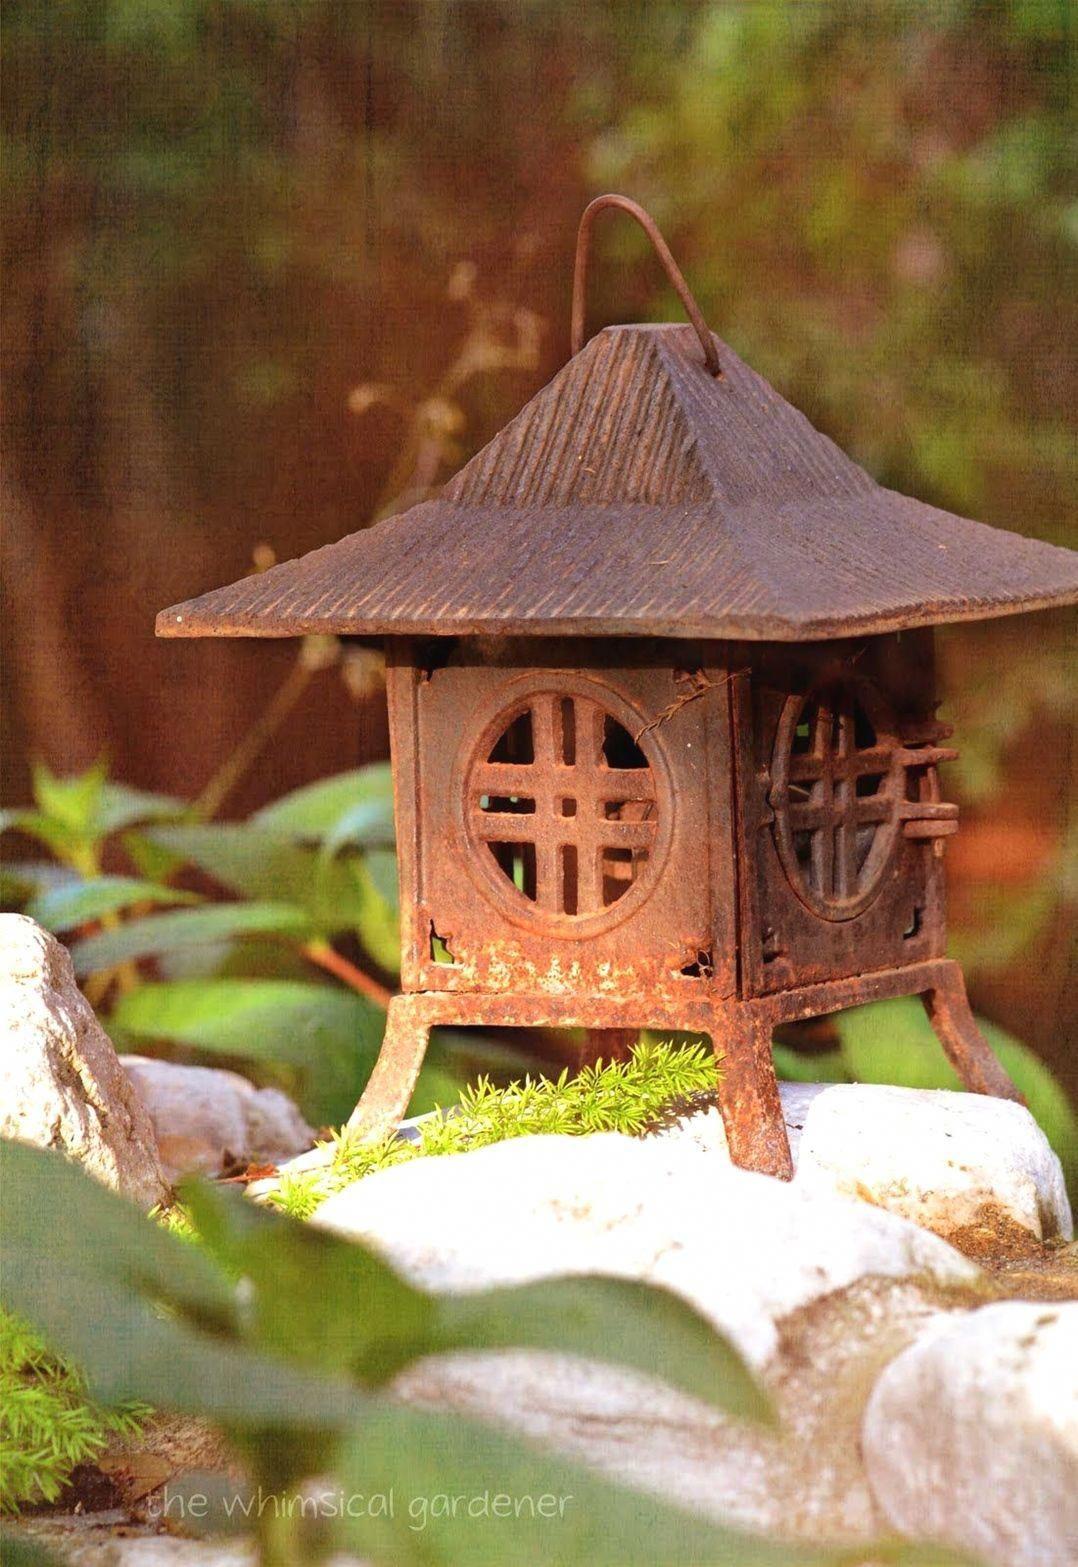 Japanese Garden Design Backyard Japanesegardens Japanesegardendesignstones Kleiner Japanischer Garten Japanischer Garten Japanische Steinlaternen